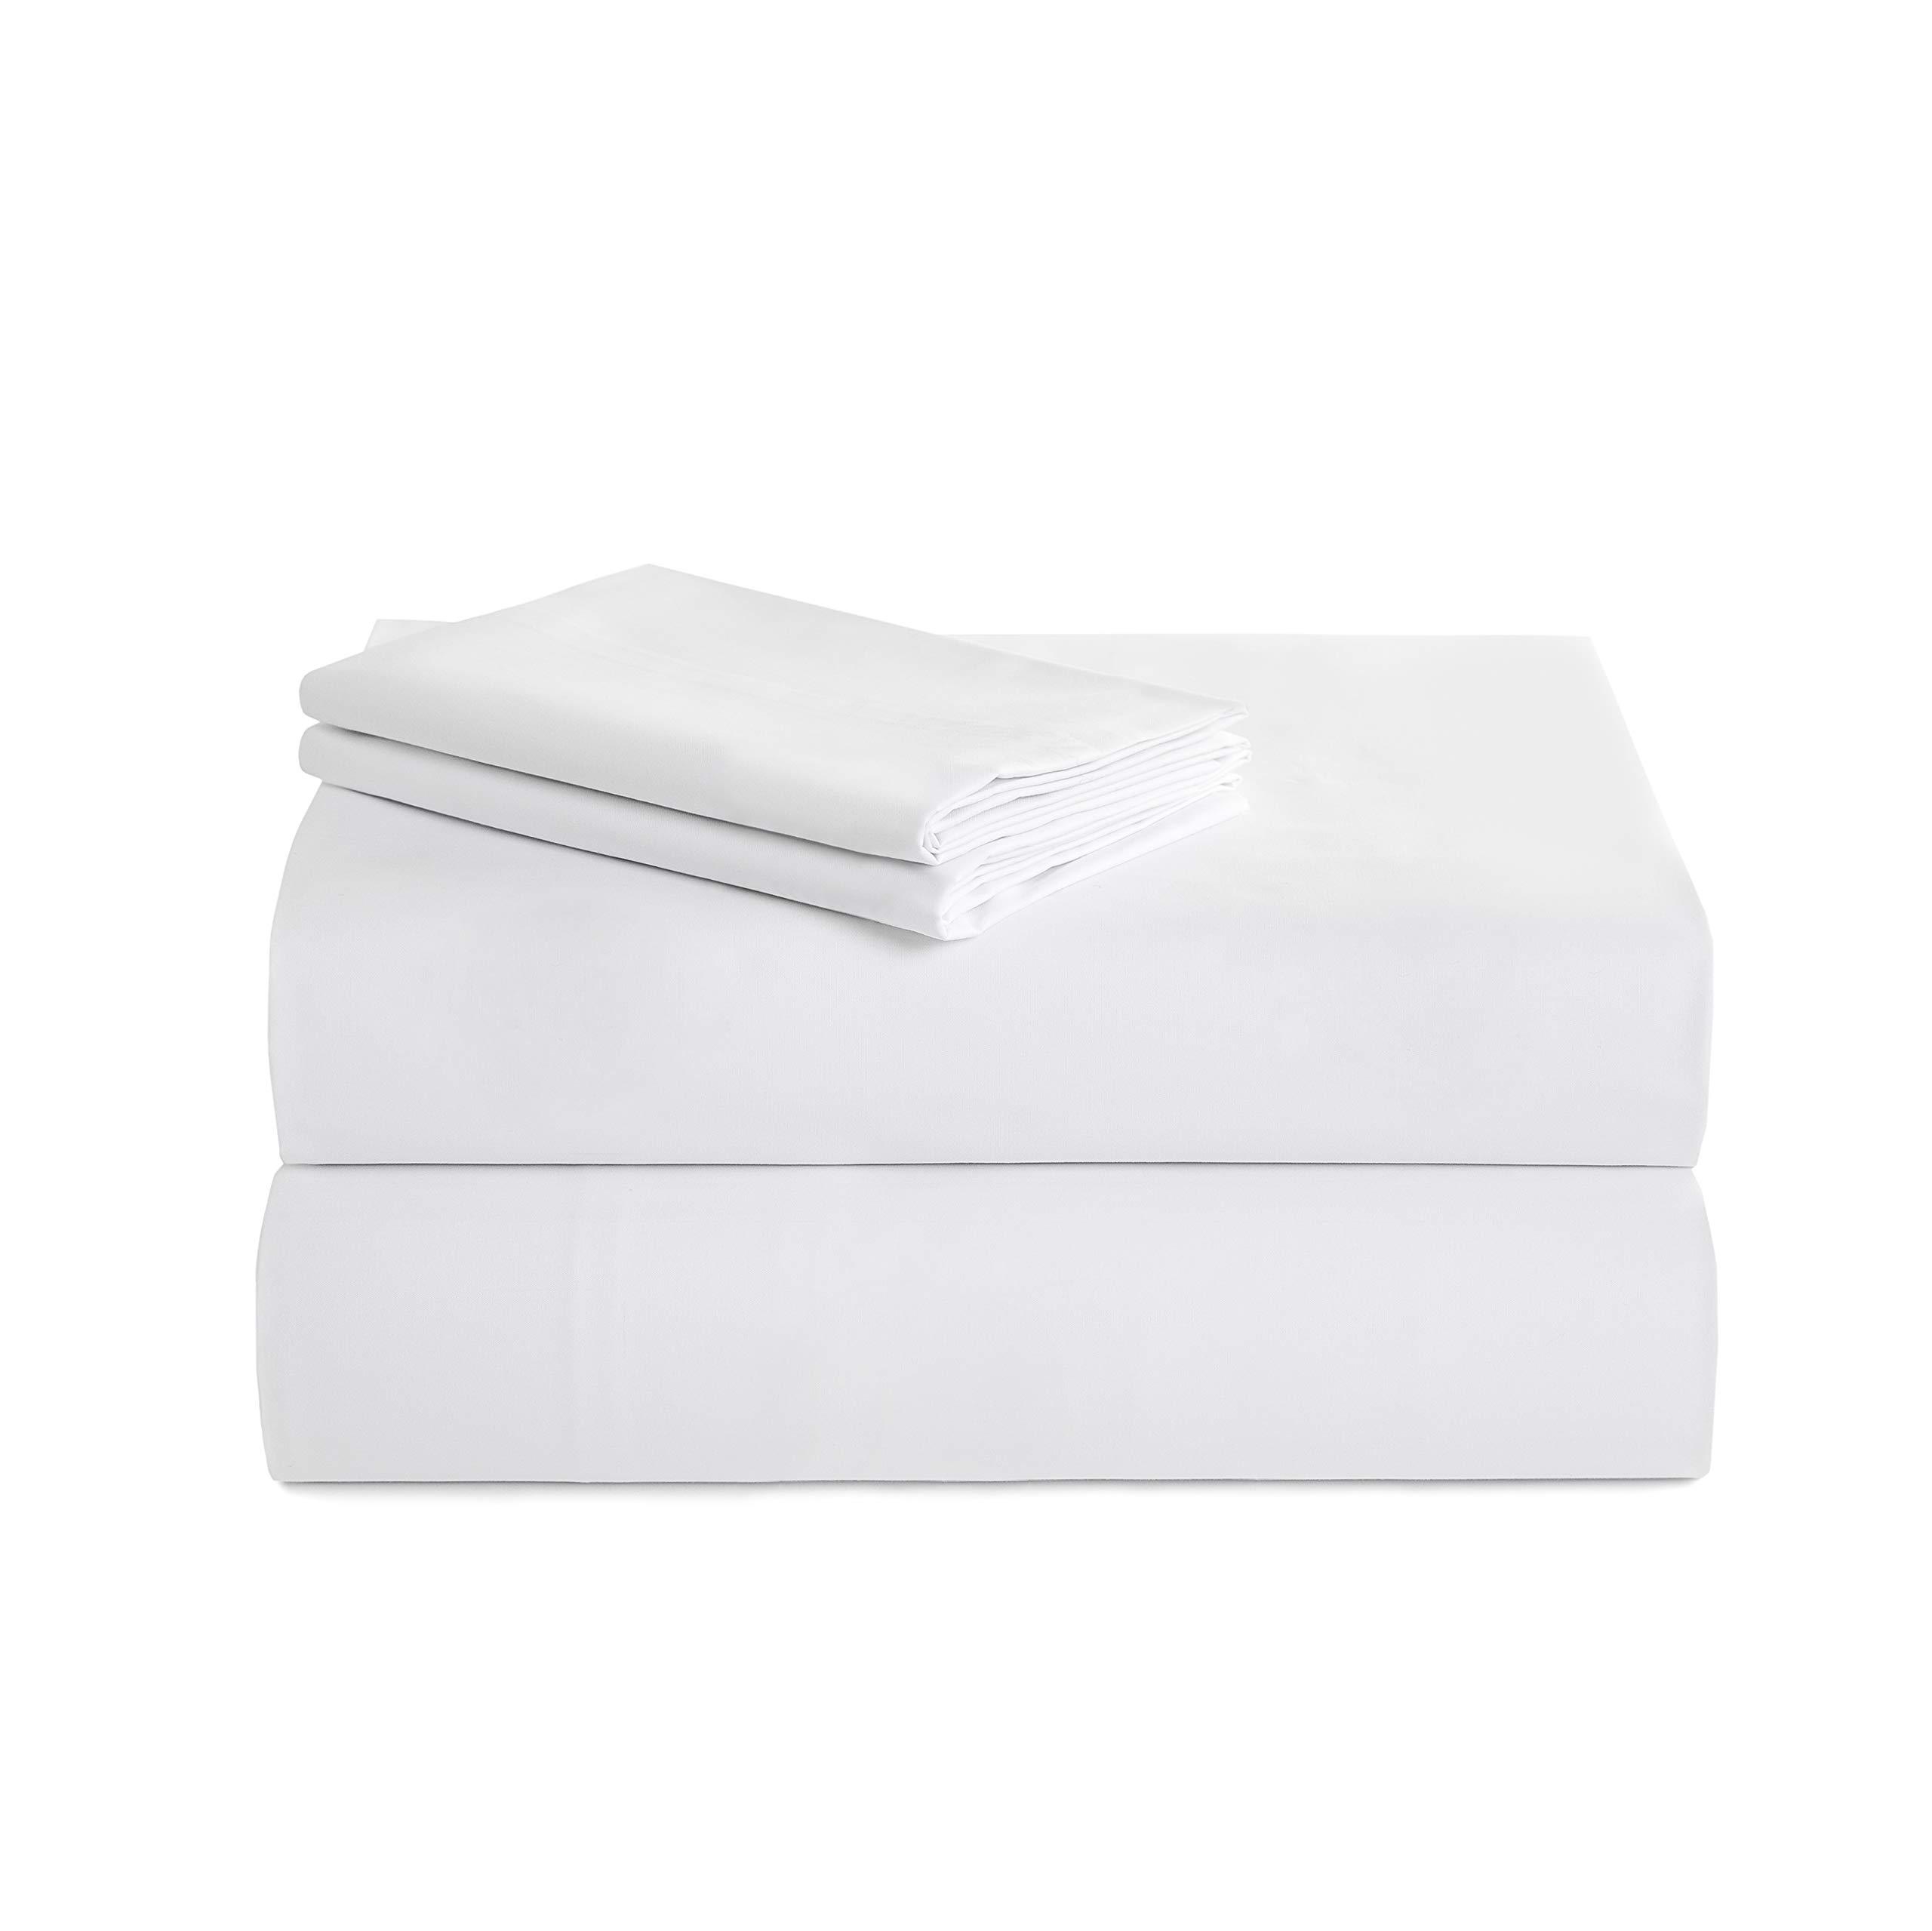 I.U Wake Up Luxury 300-Thread-Count Percale Peruvian Pima Cotton Twin Bed Sheet Set, White